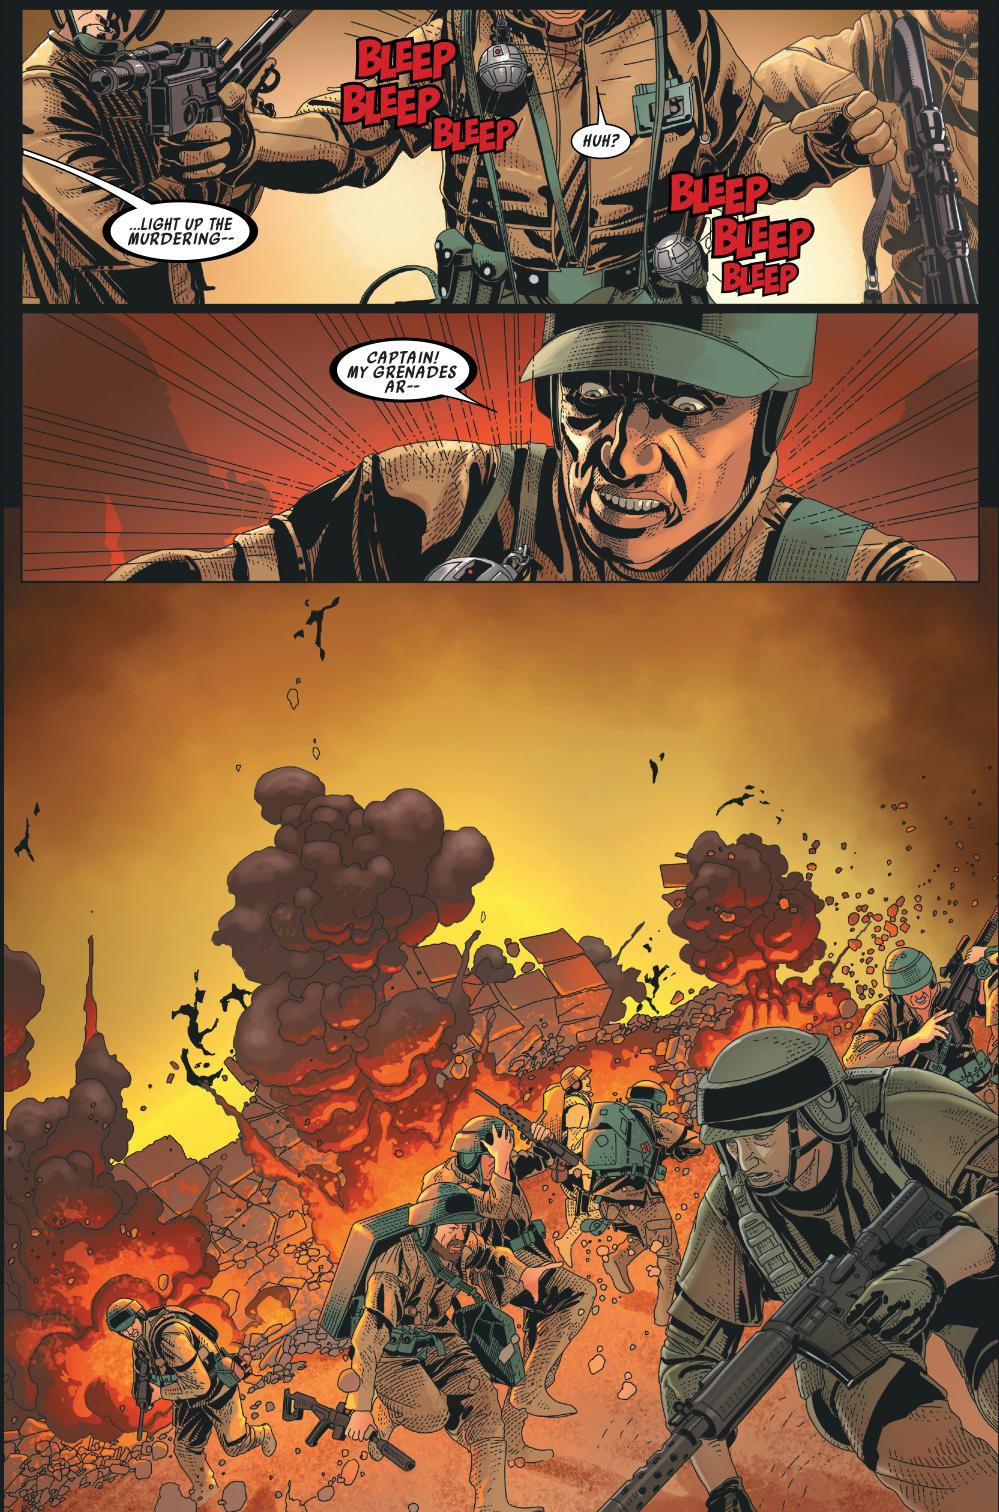 darth vader slaughtering rebel soldiers 3